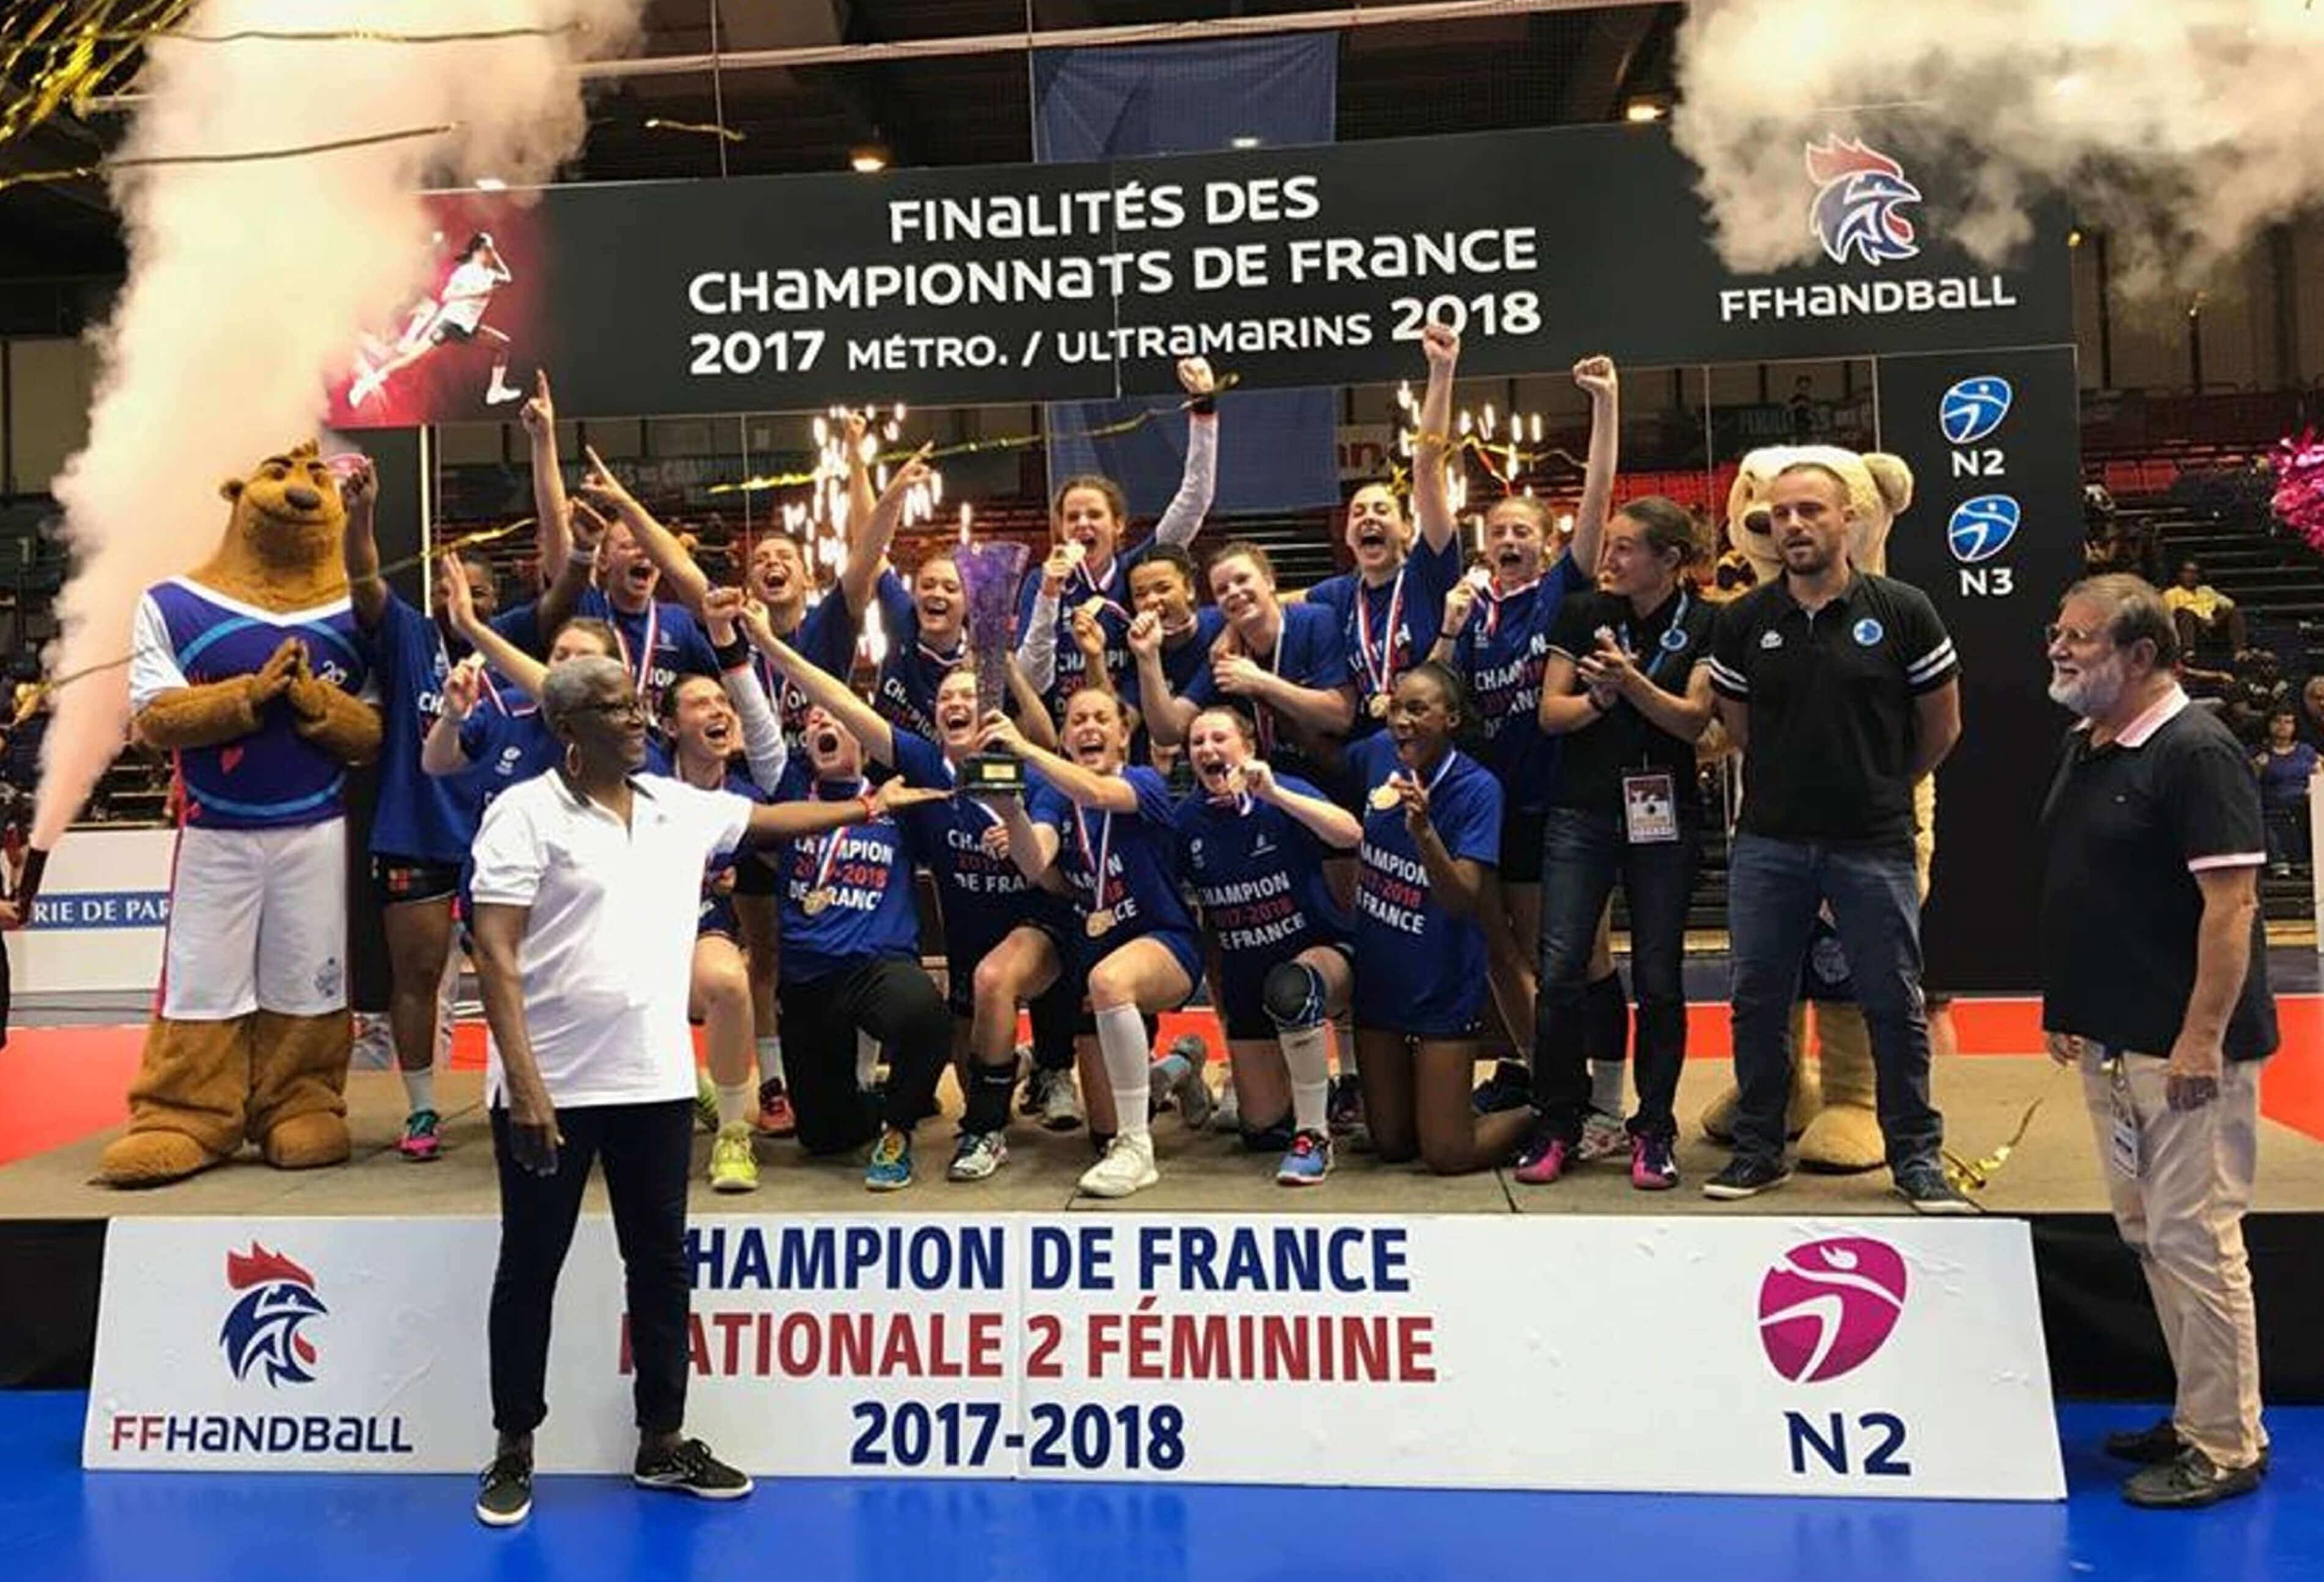 2018-06-11-championnat-france-article@2x